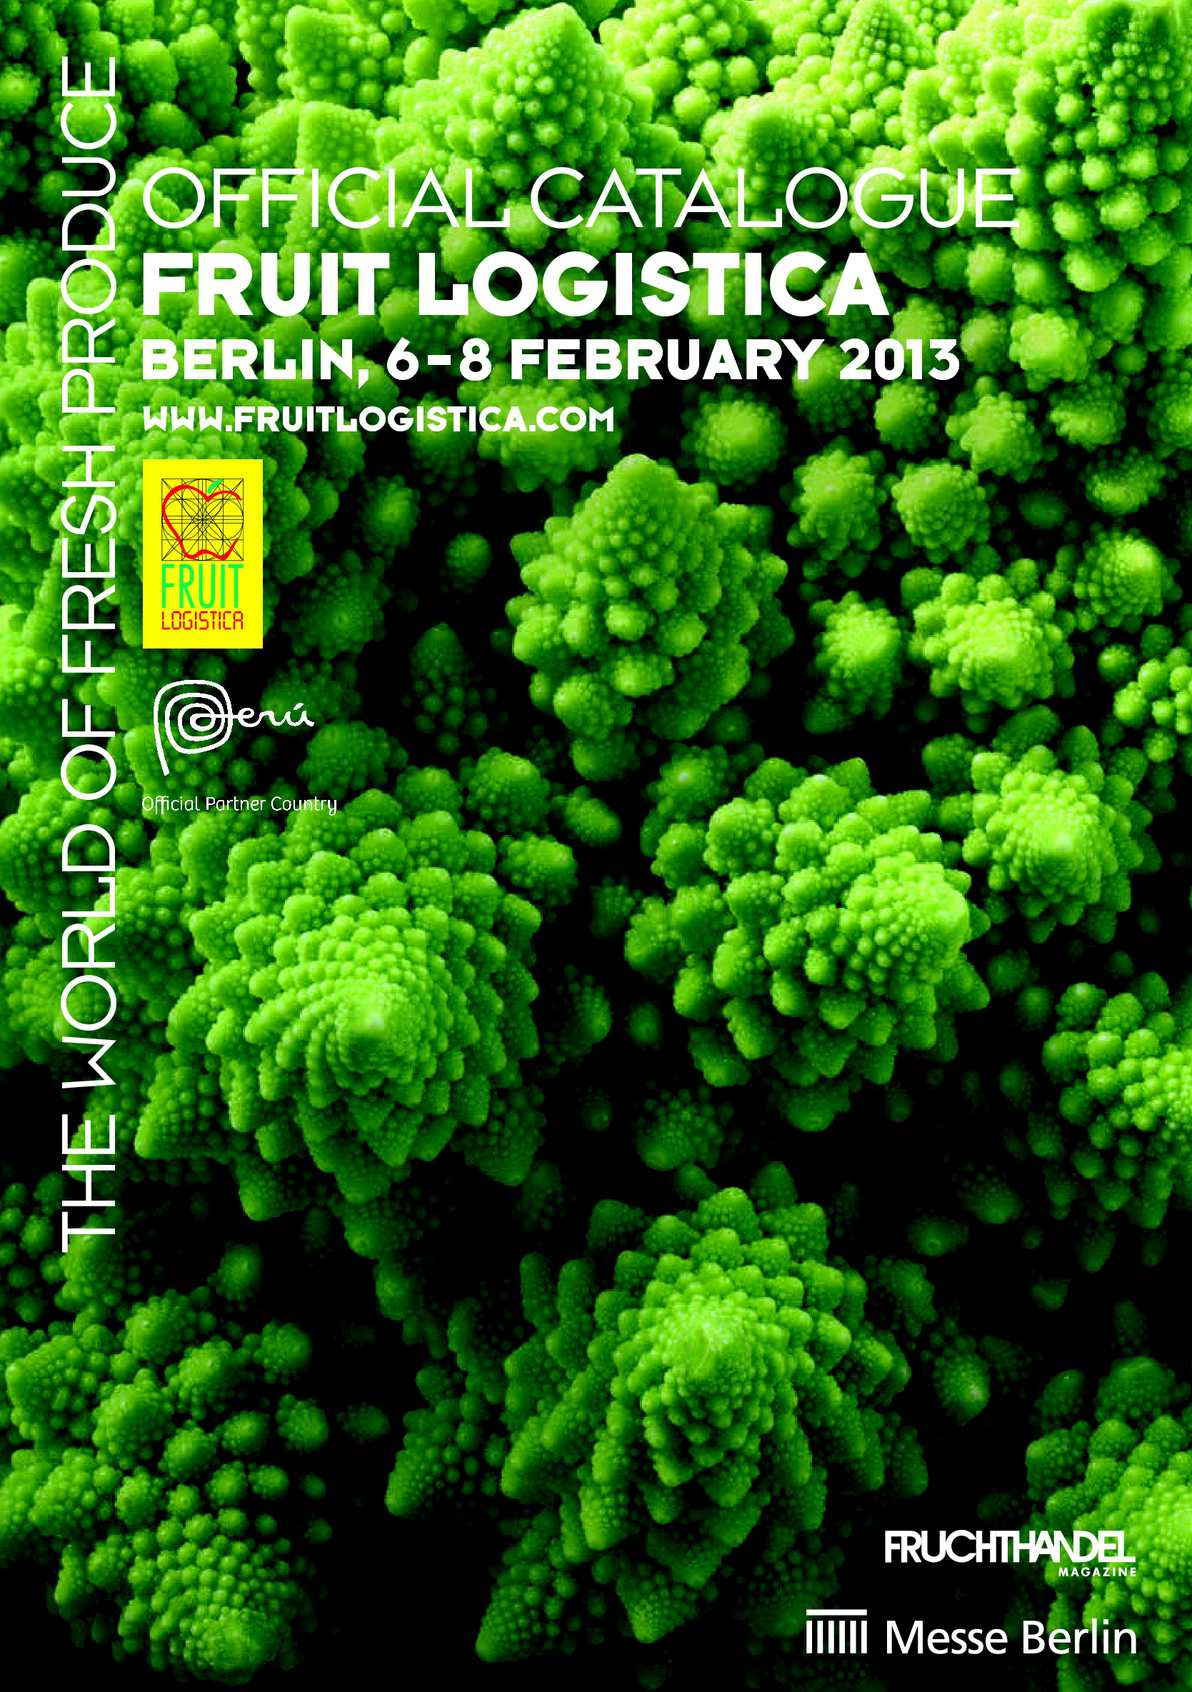 Calaméo - FRUIT LOGISTICA 2013 Official Catalogue